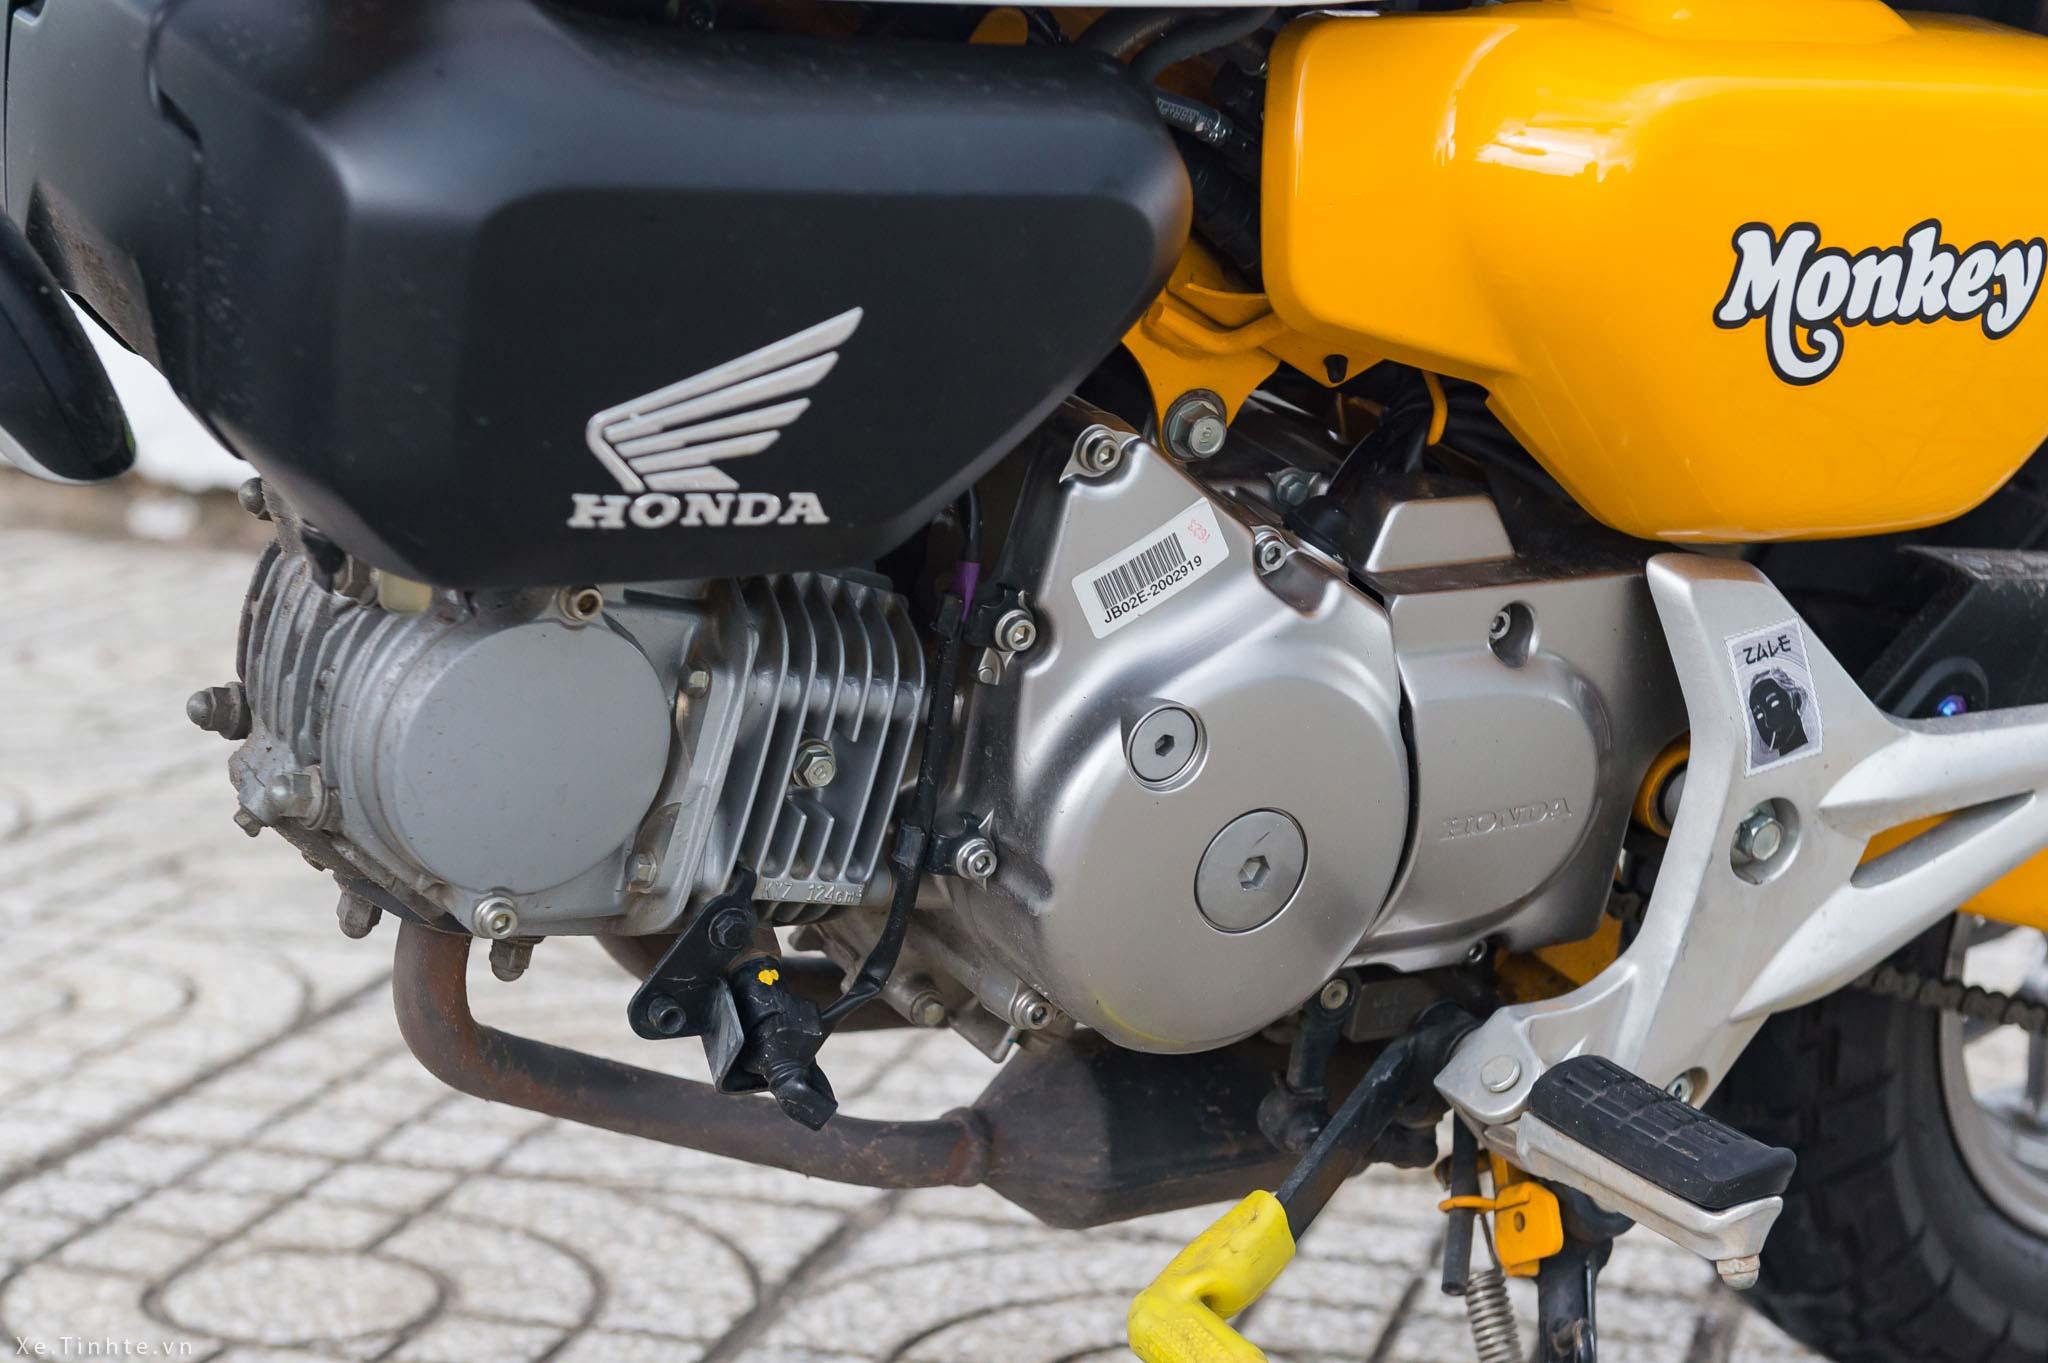 Honda_Monkey_125_Xe_Tinhte (23).jpg